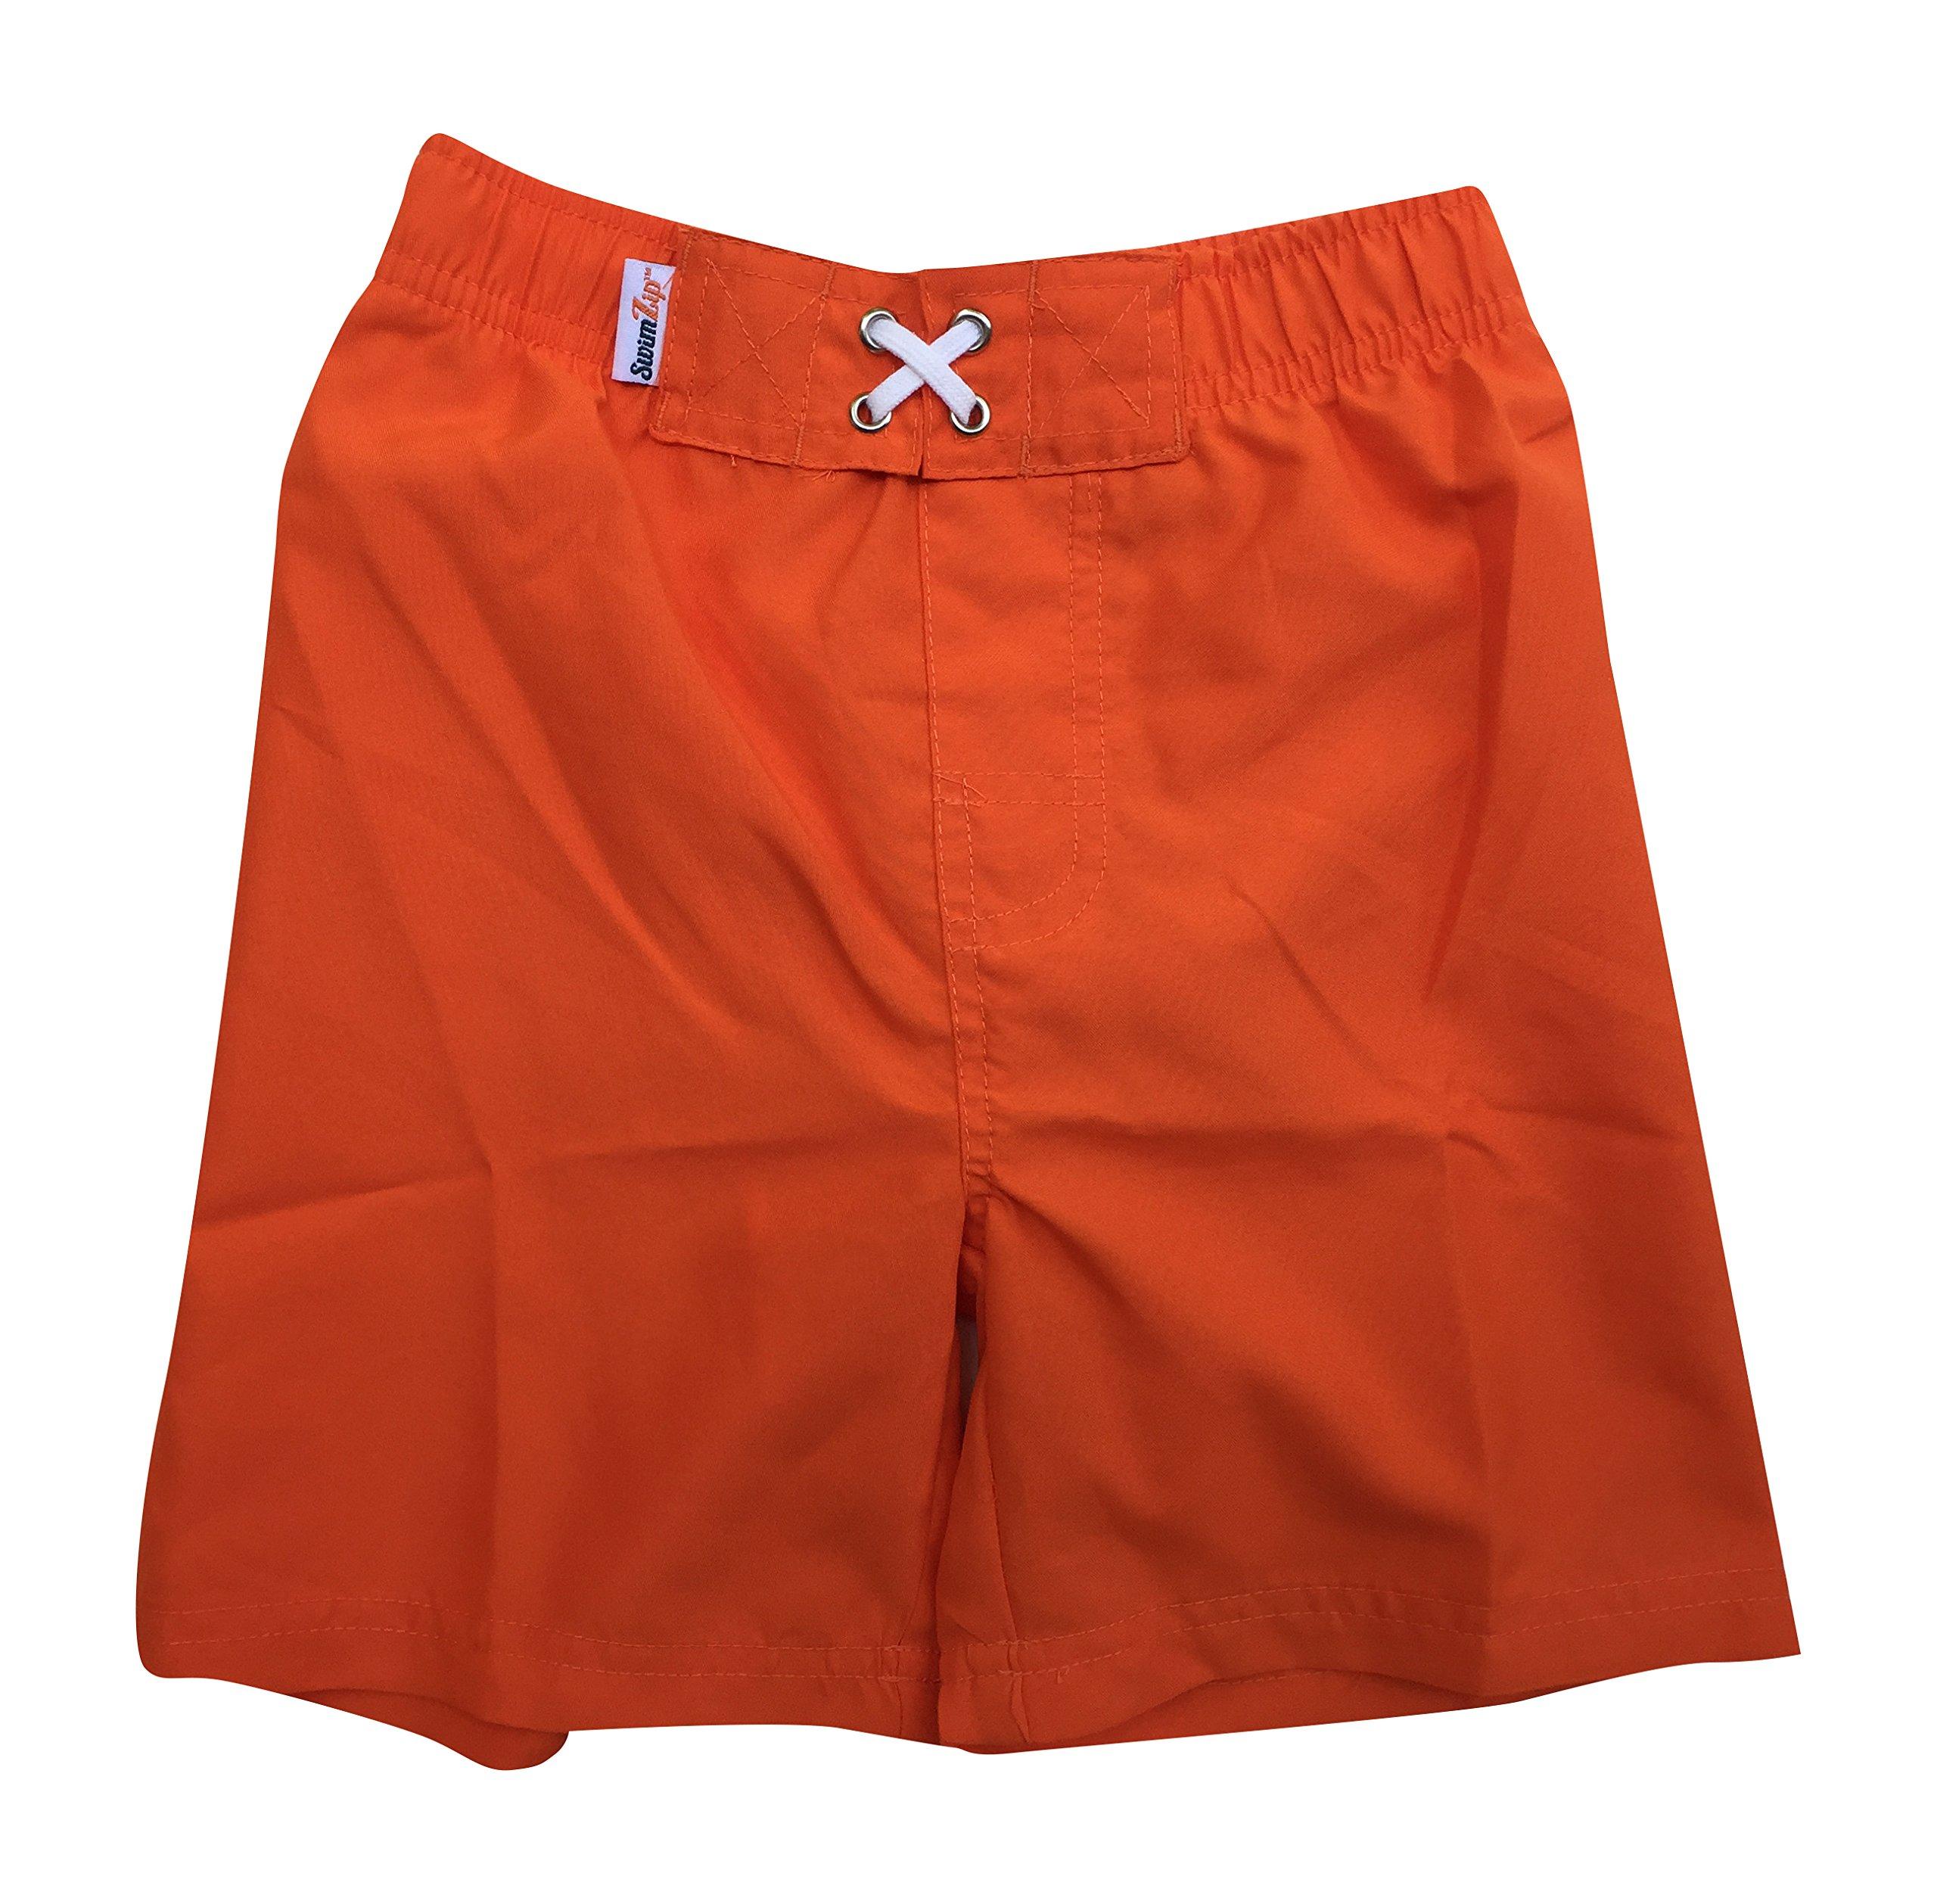 d1fae7c257 Galleon - SwimZip Little Boys' Swim Trunks With UPF 50+ UV Sun Protection,  Orang 0-3 Month